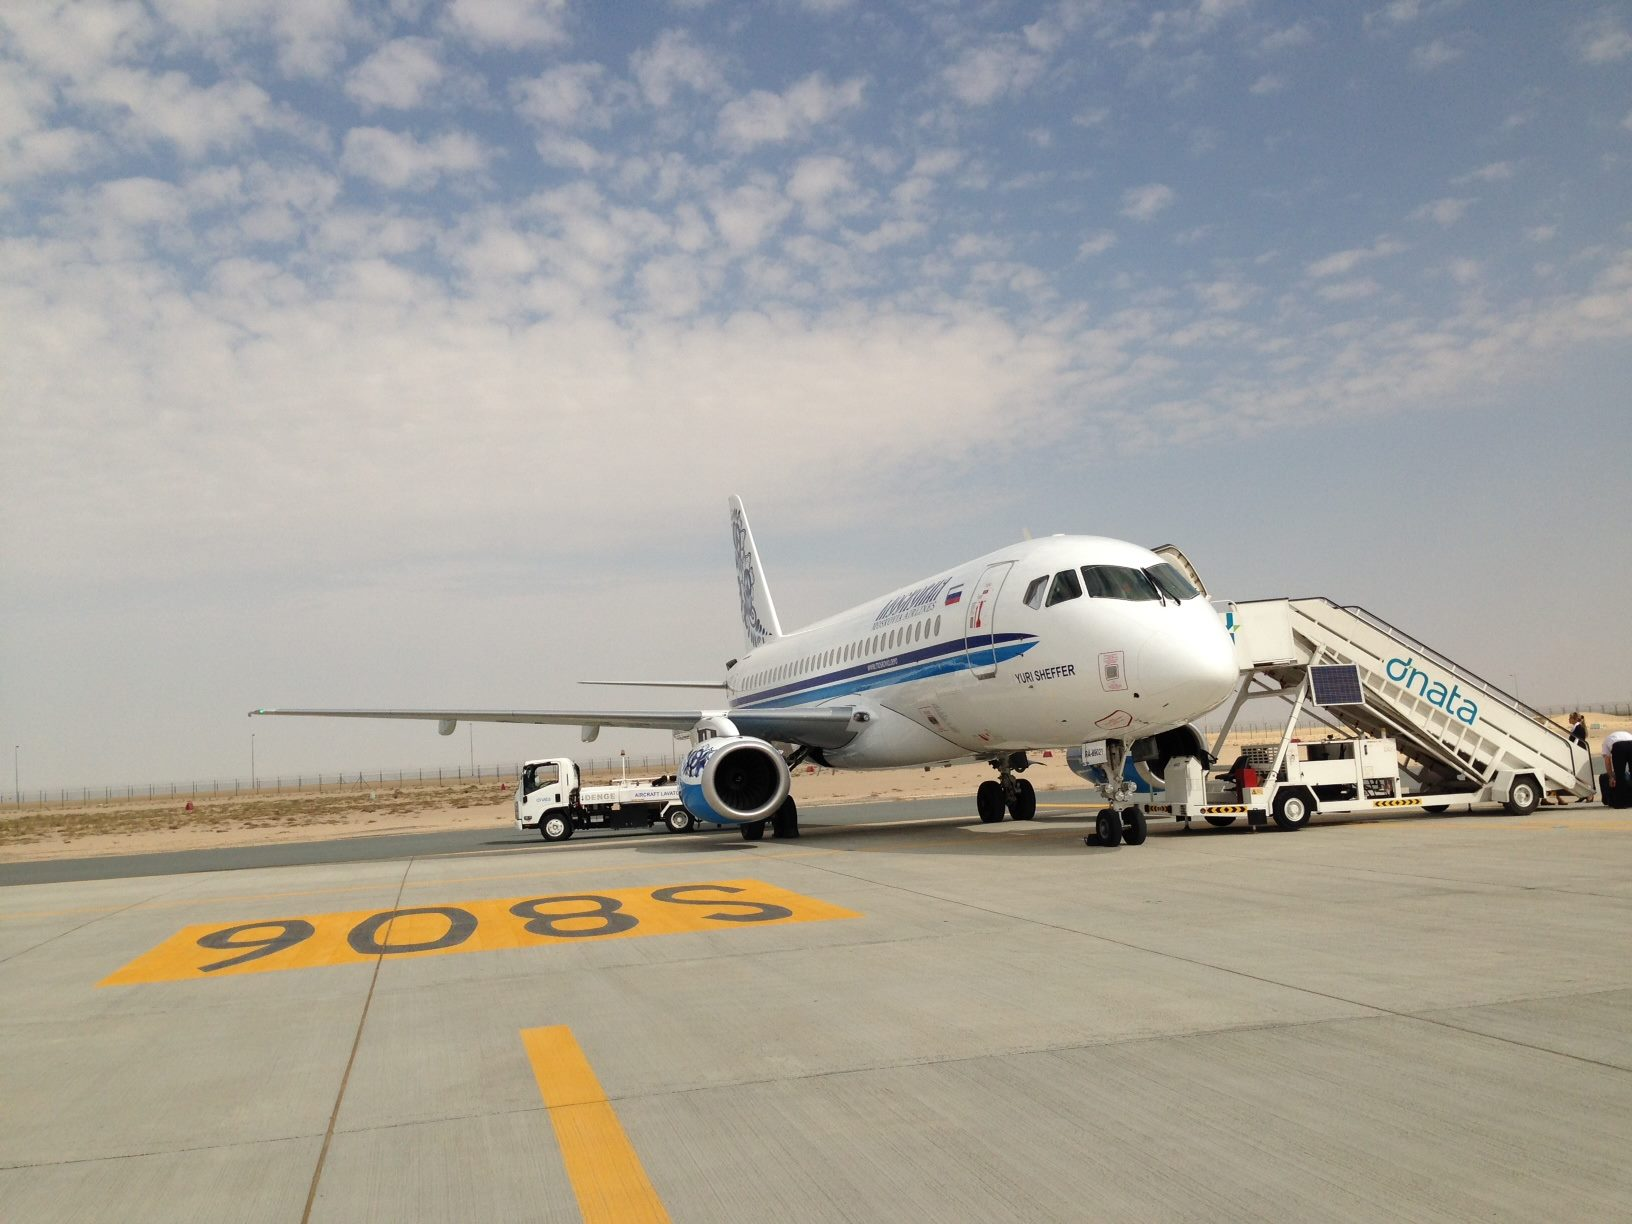 Sukhoi Superjet-100 - На салоне в Дубаи